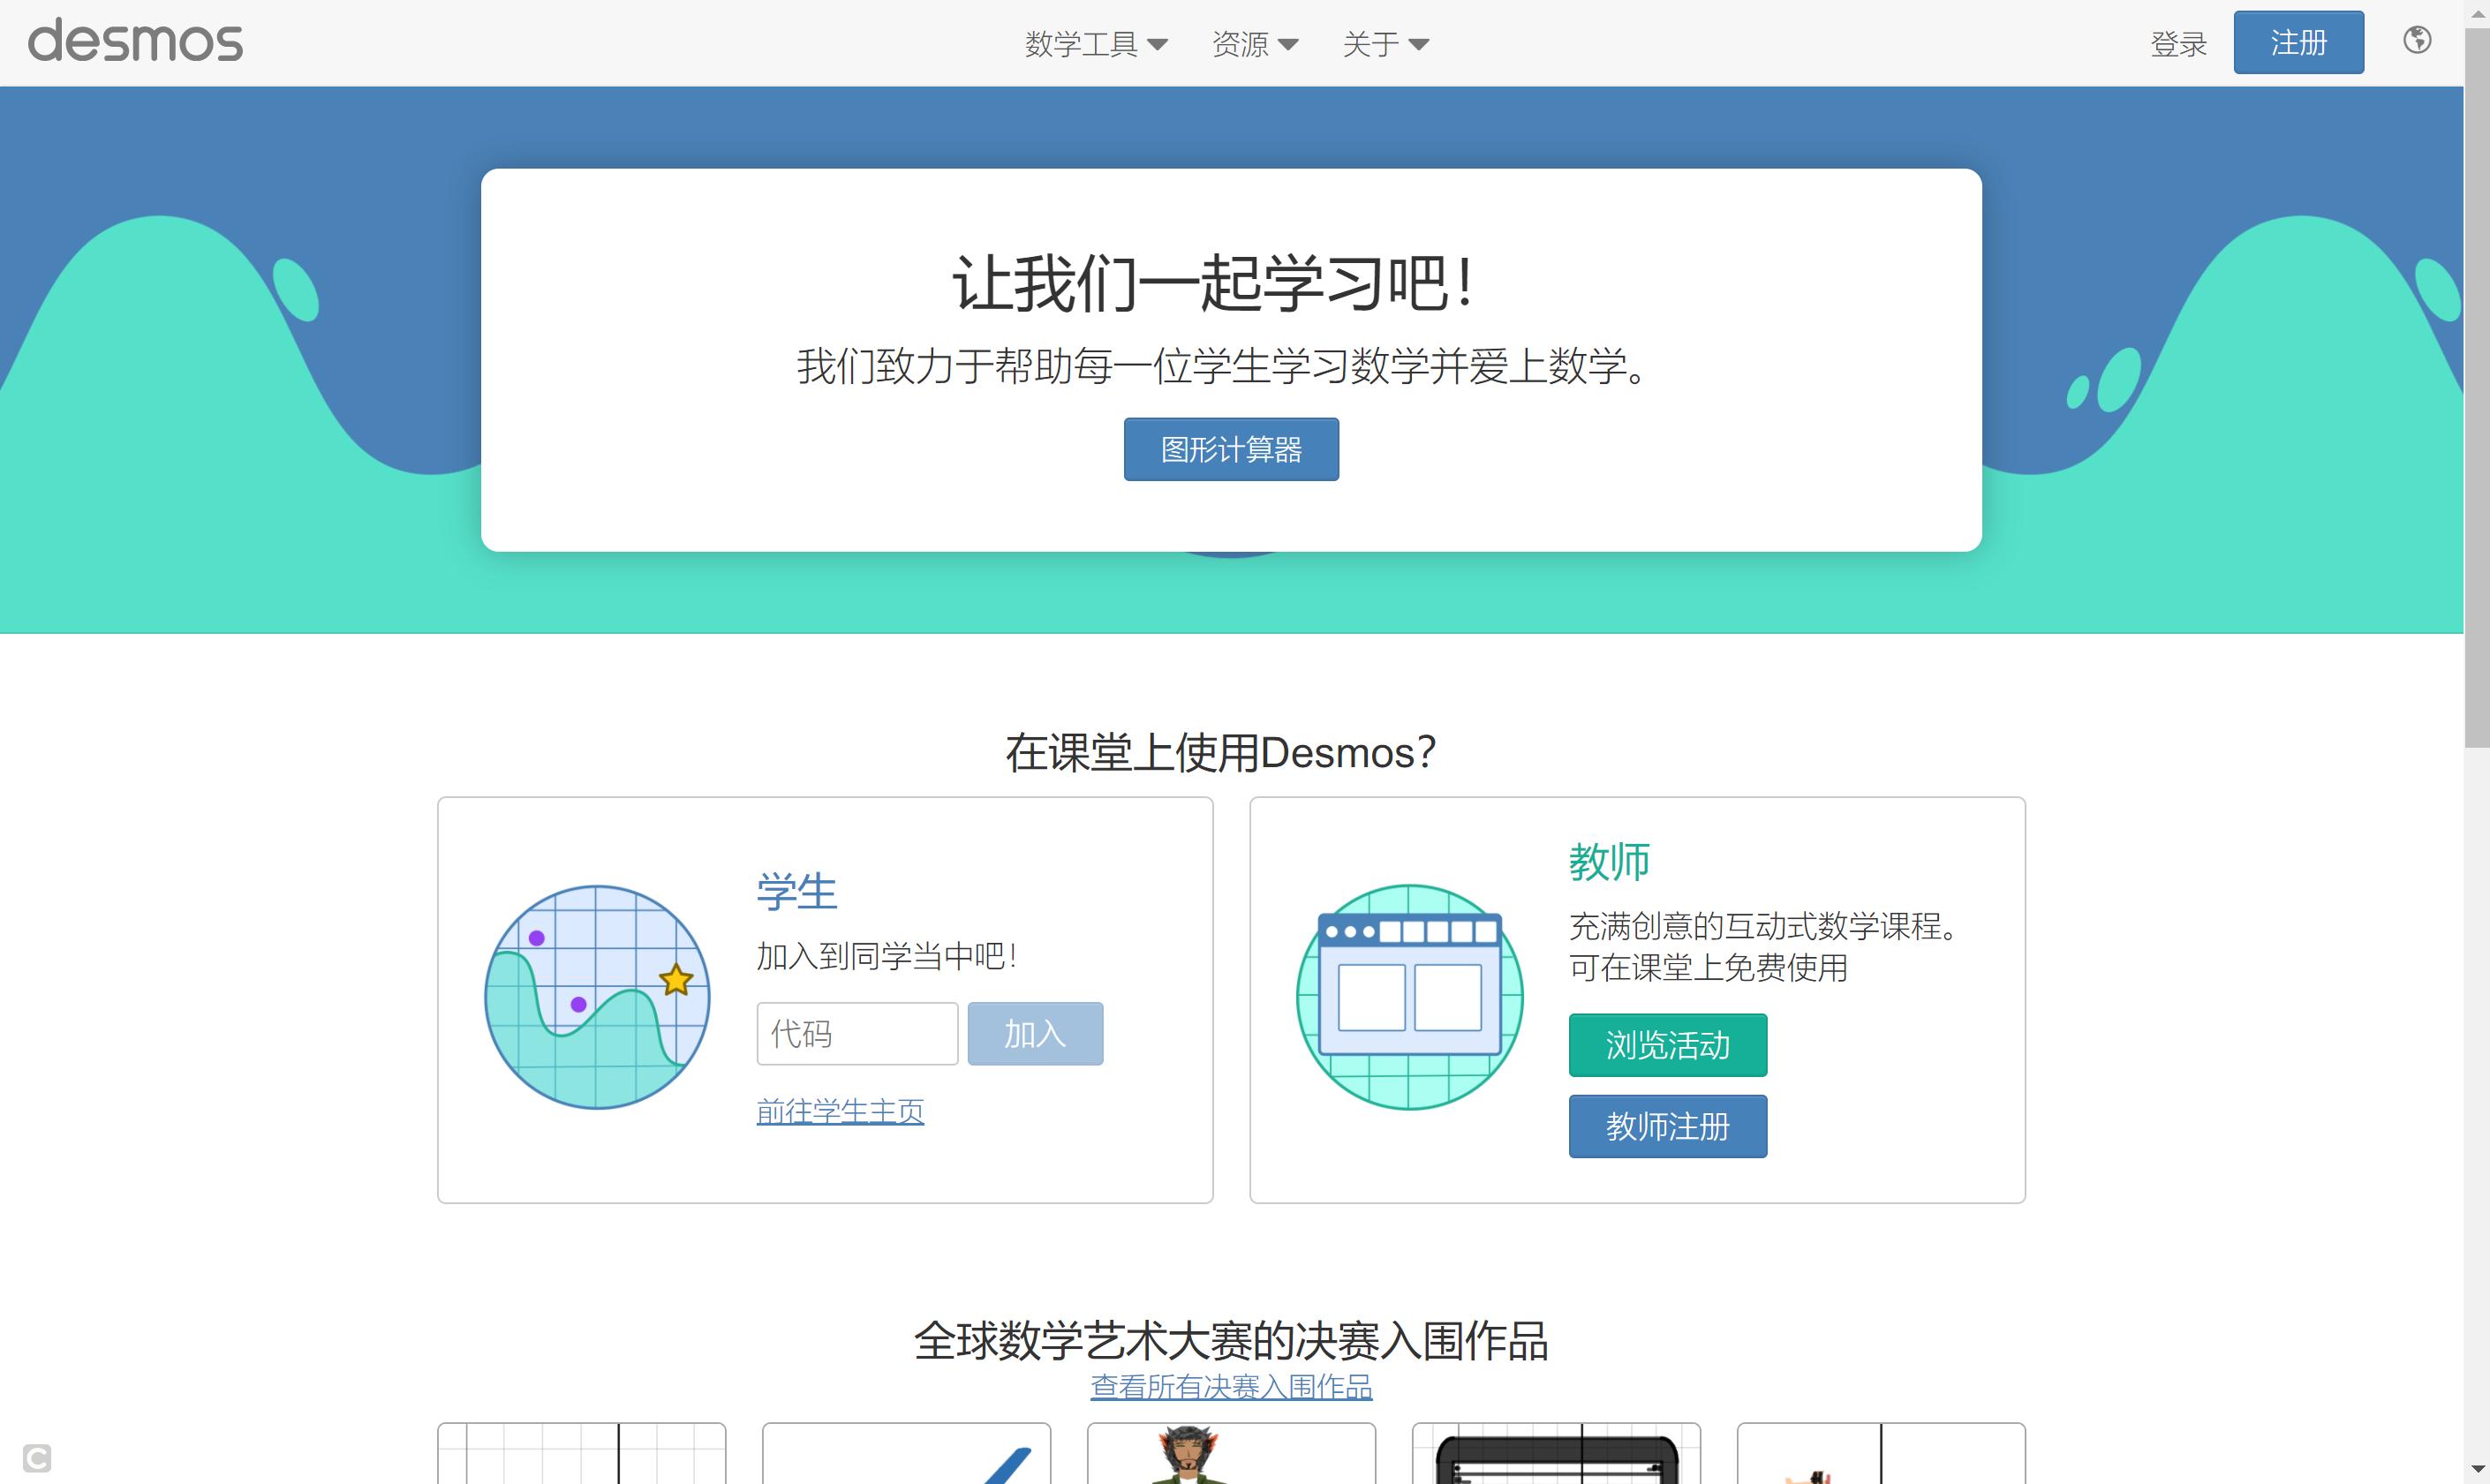 Desmos-可能是迄今为止最好用的免费Web端数学图像绘制工具